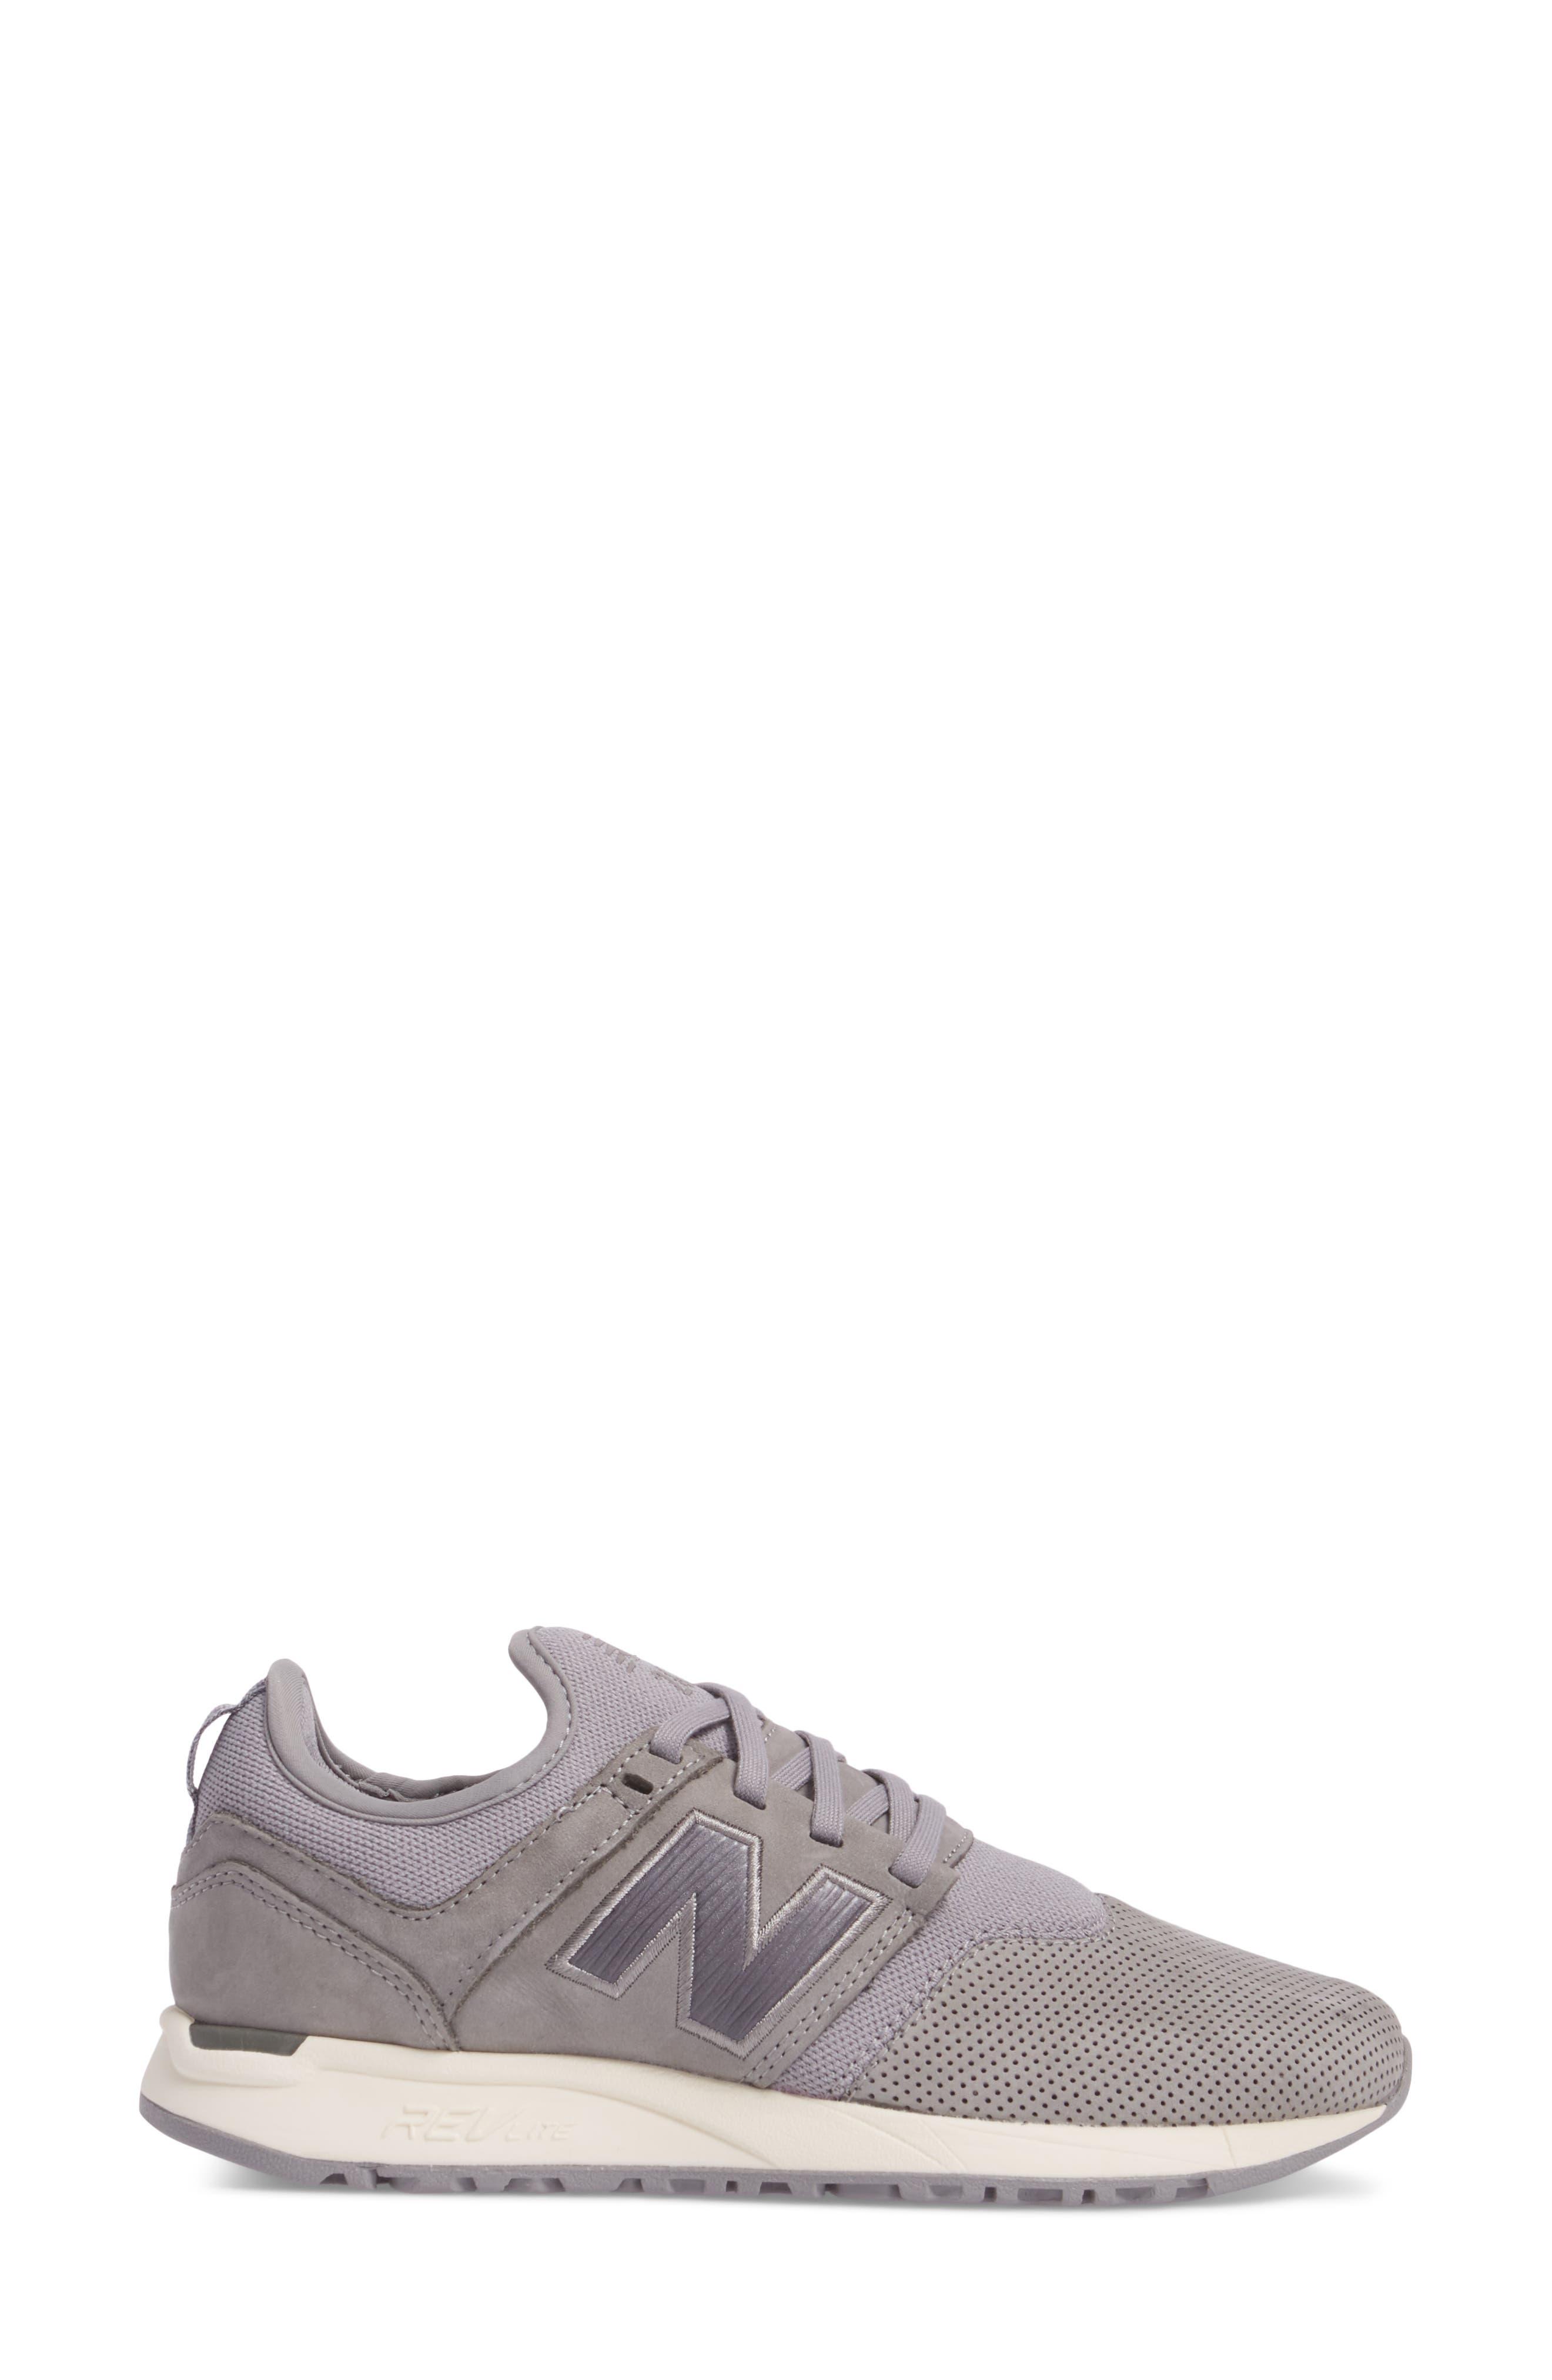 Sport Style 247 Sneaker,                             Alternate thumbnail 3, color,                             Marblehead